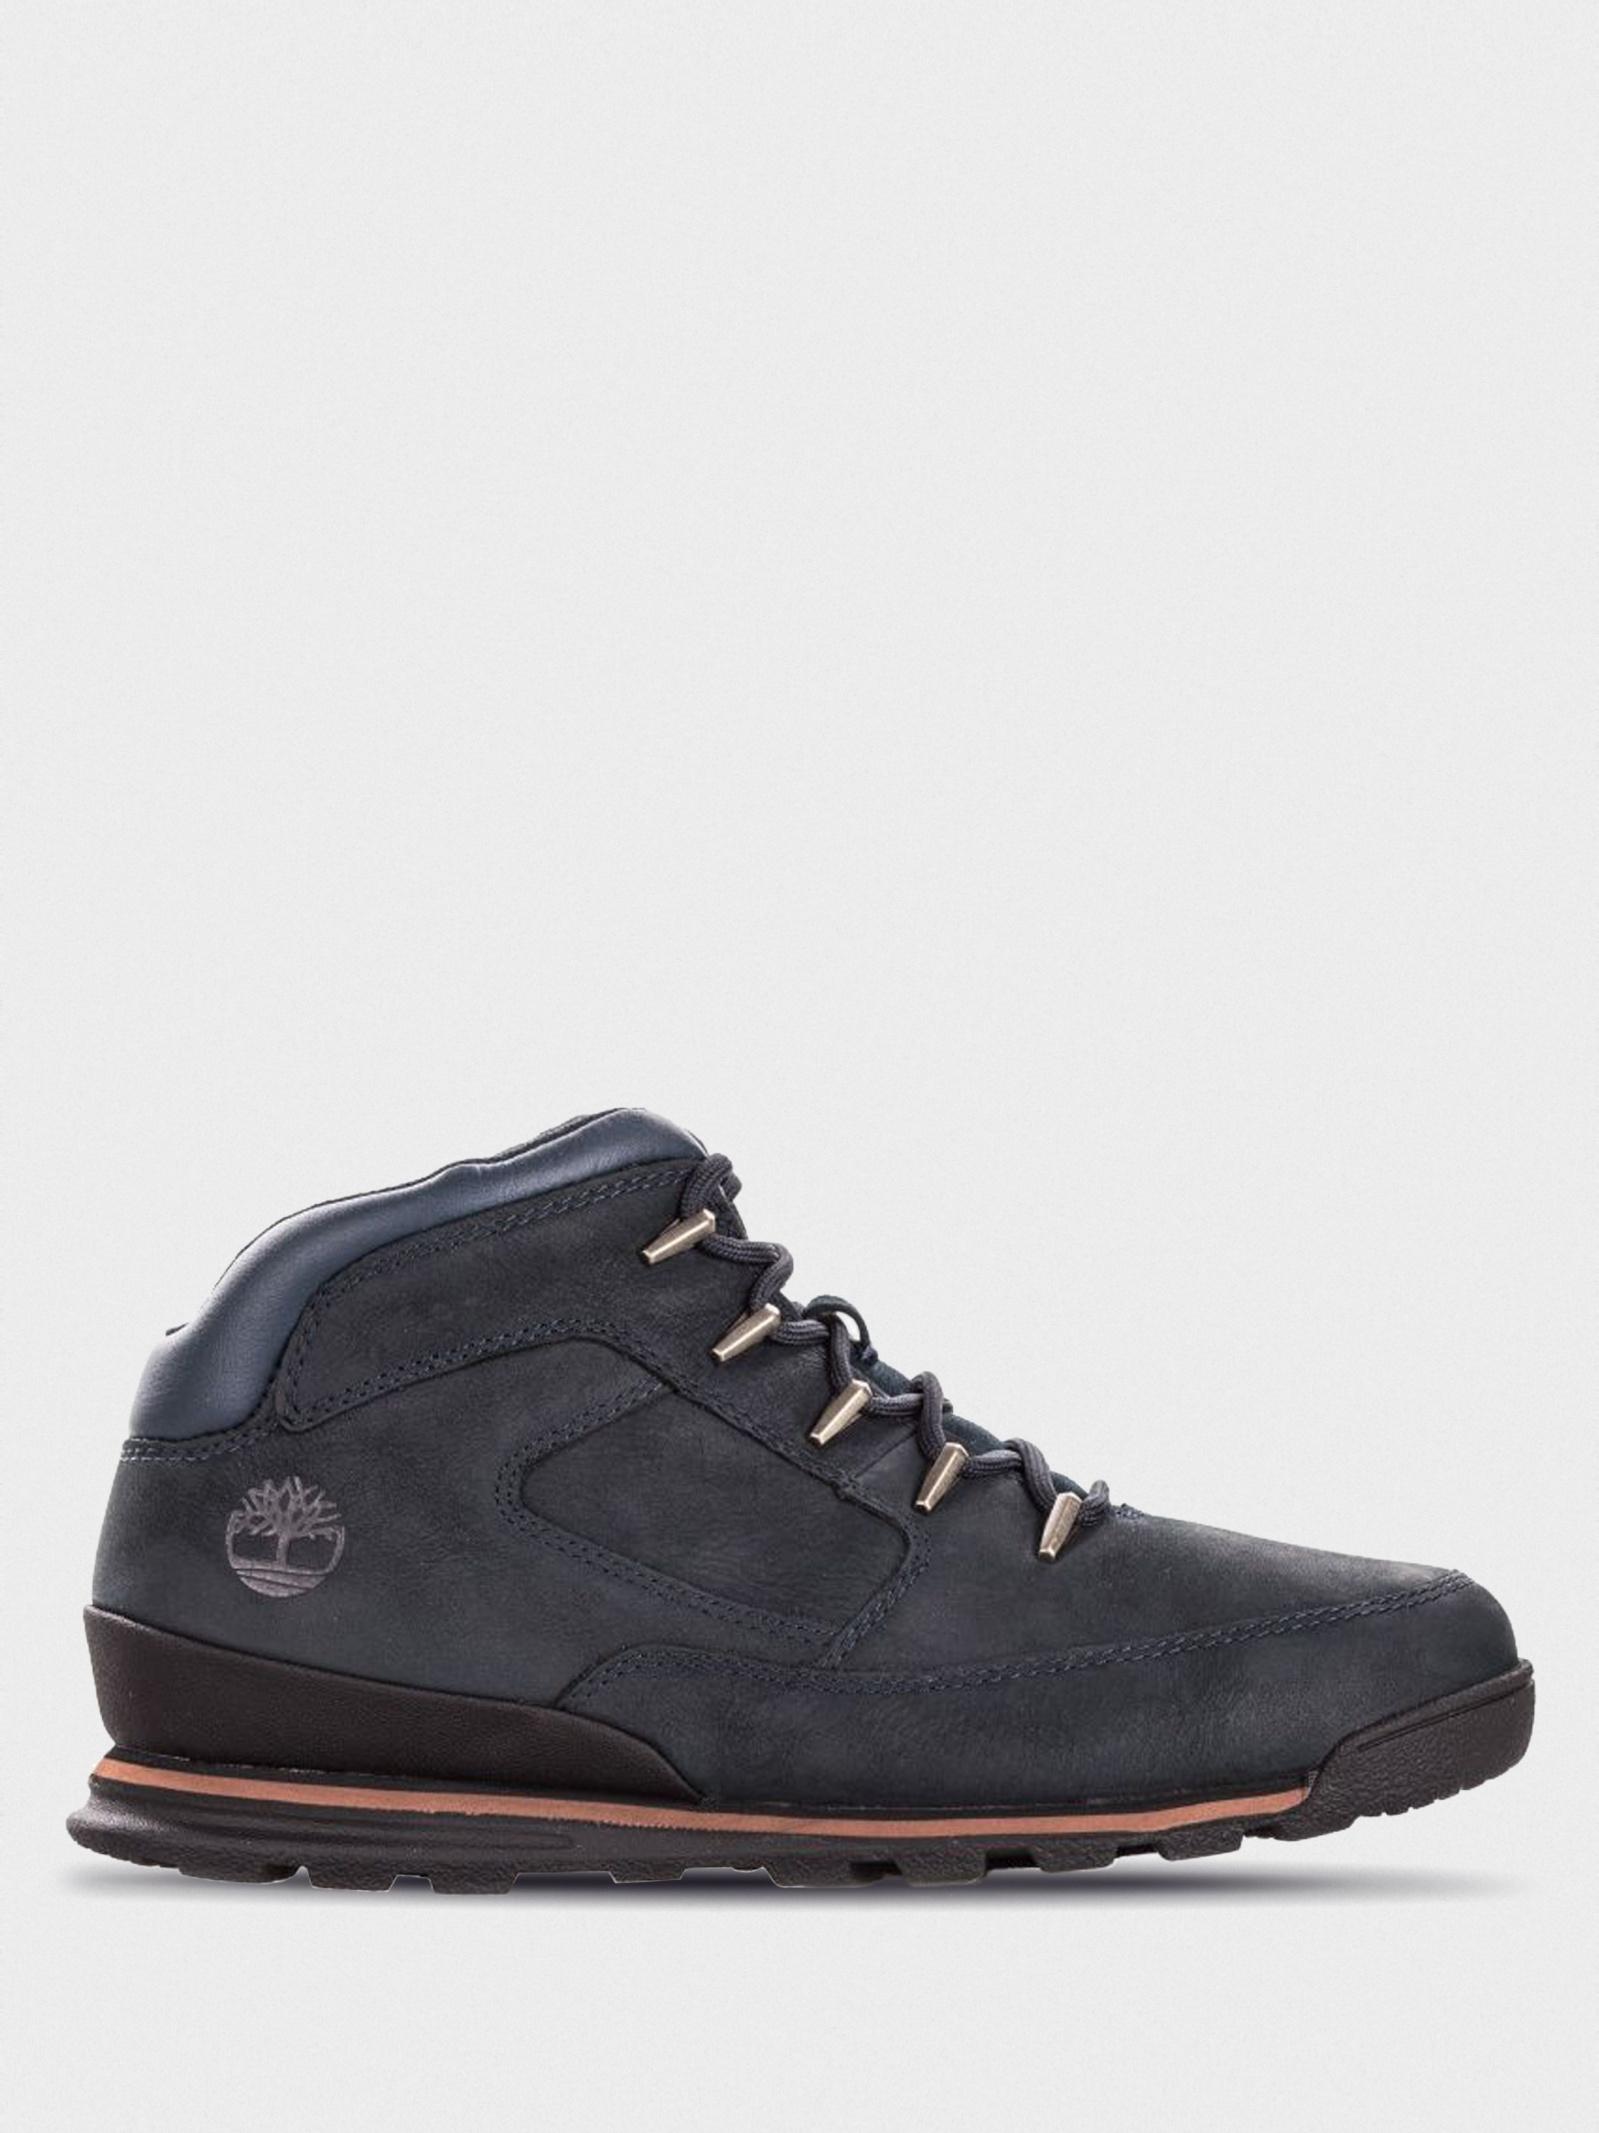 Ботинки мужские Timberland Hiker TF3799 , 2017